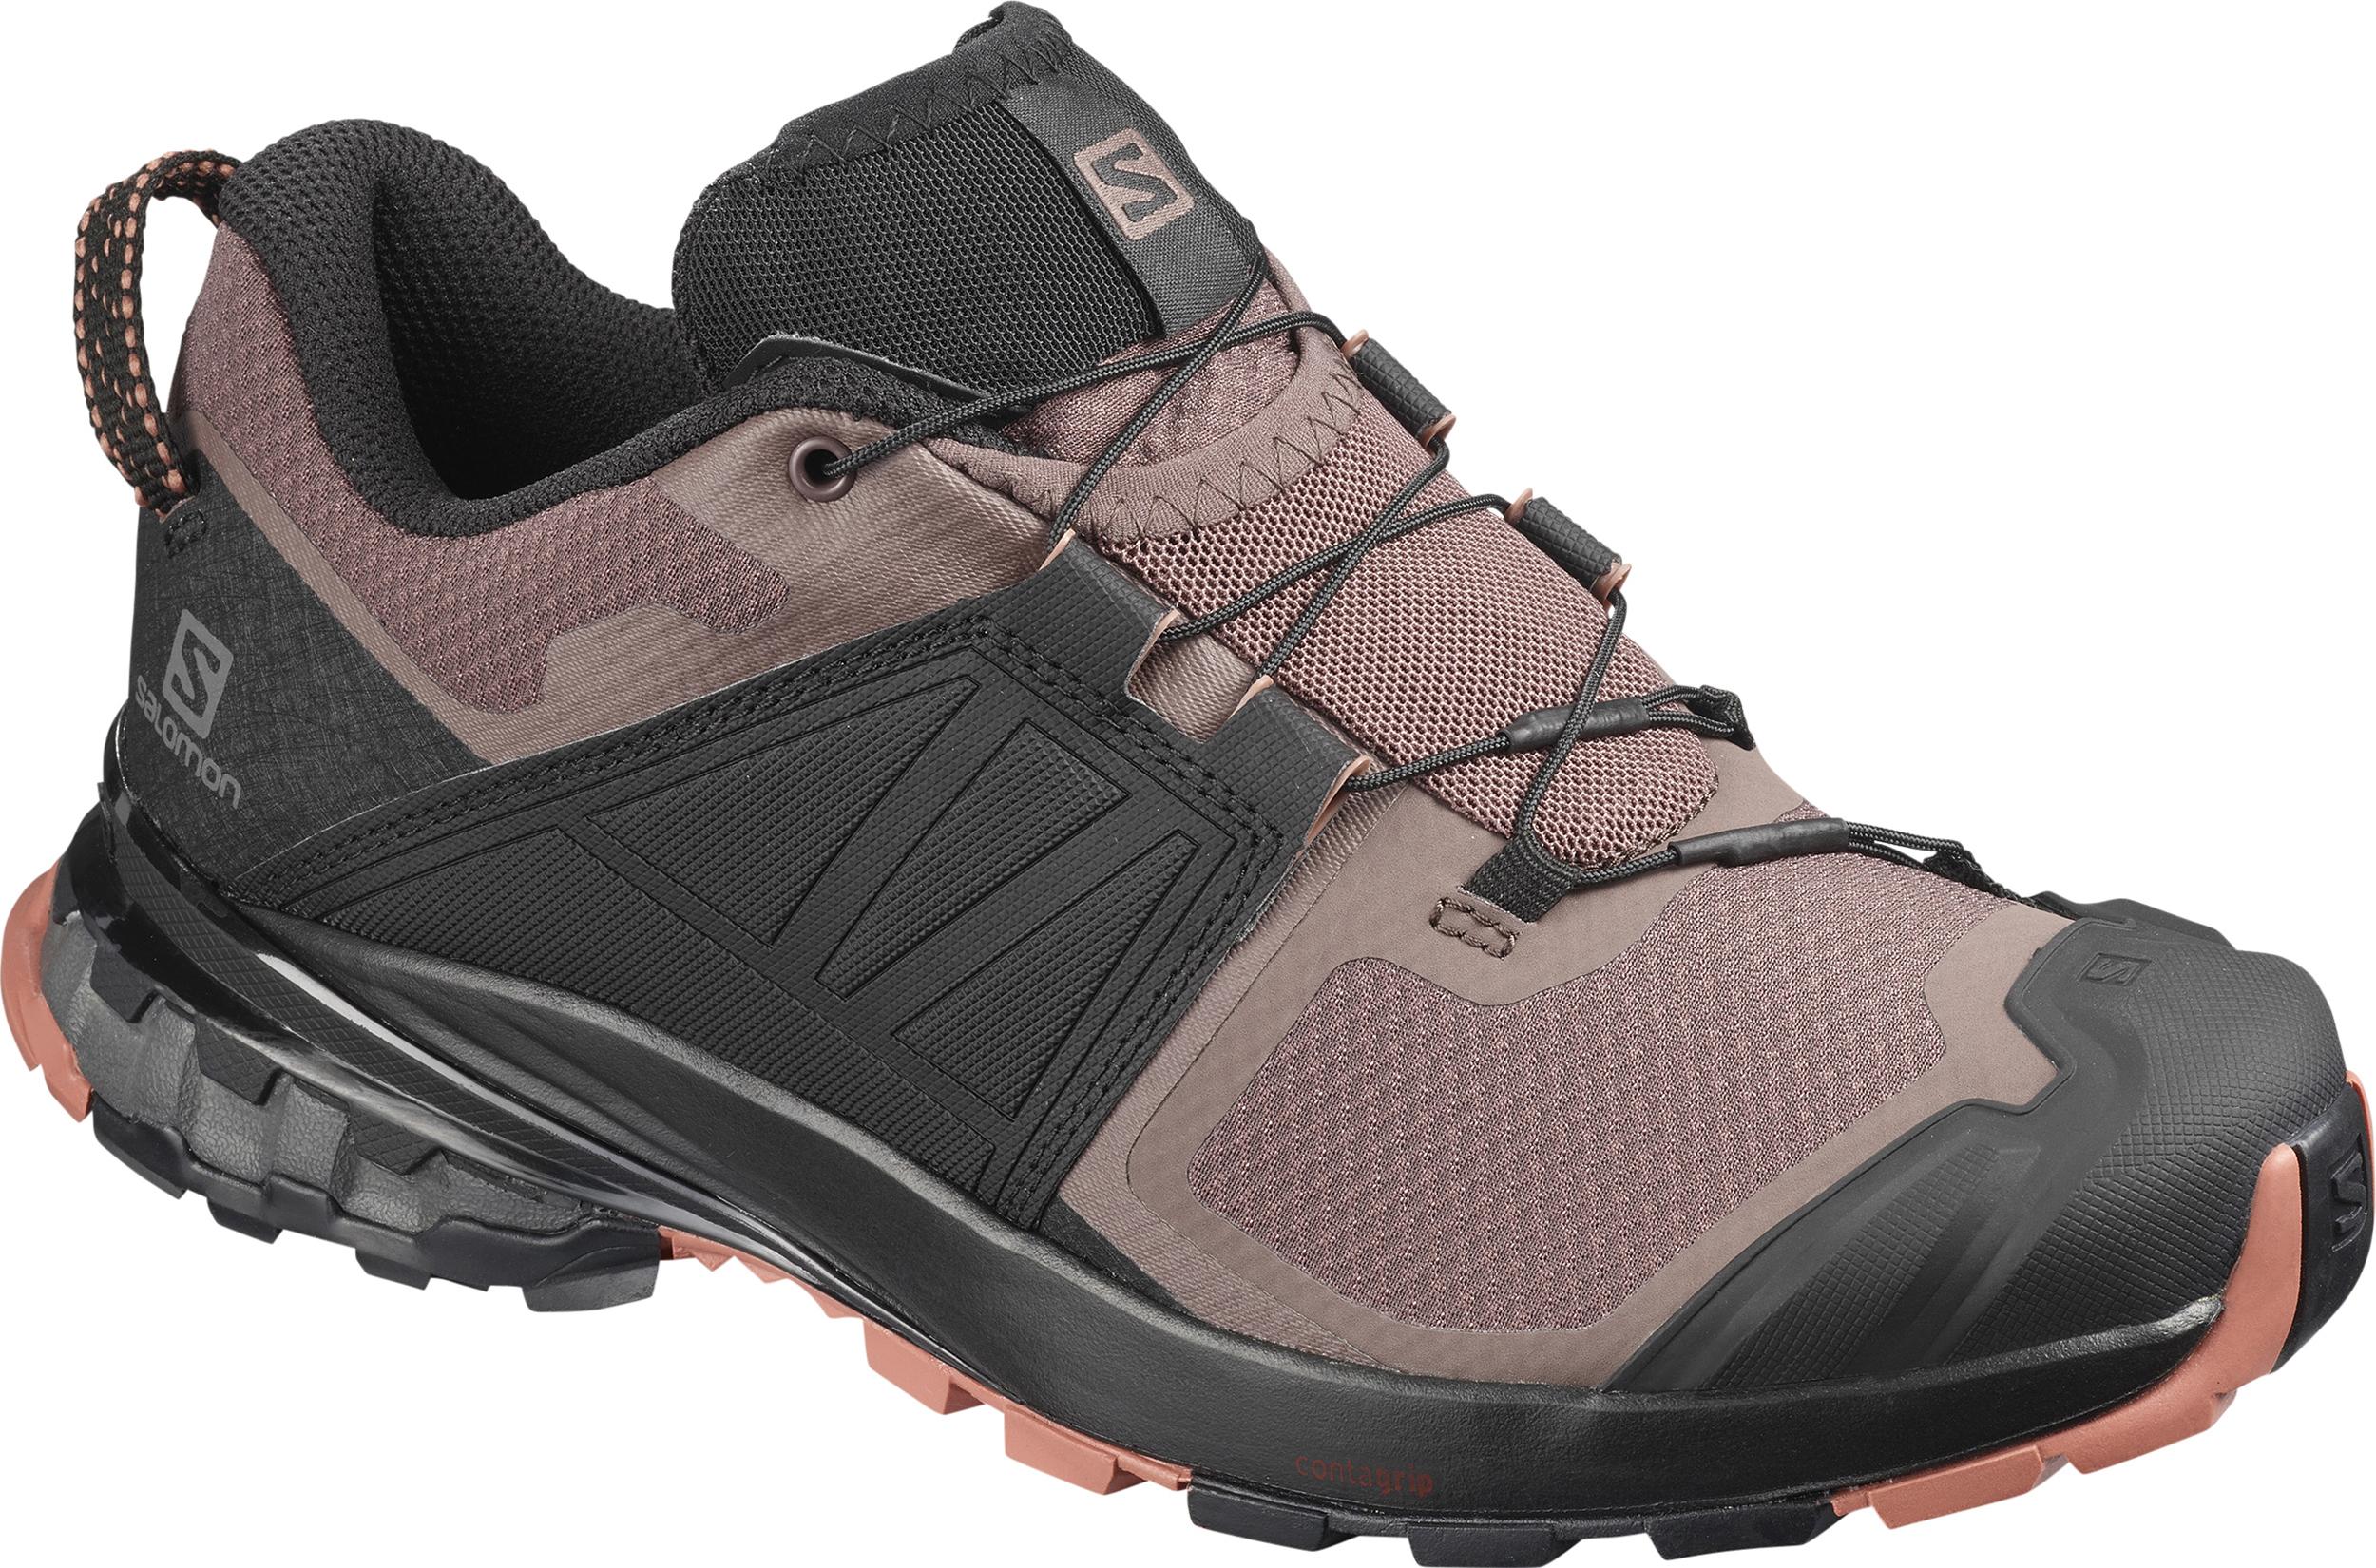 Salomon XA Wild Trail Running Shoes